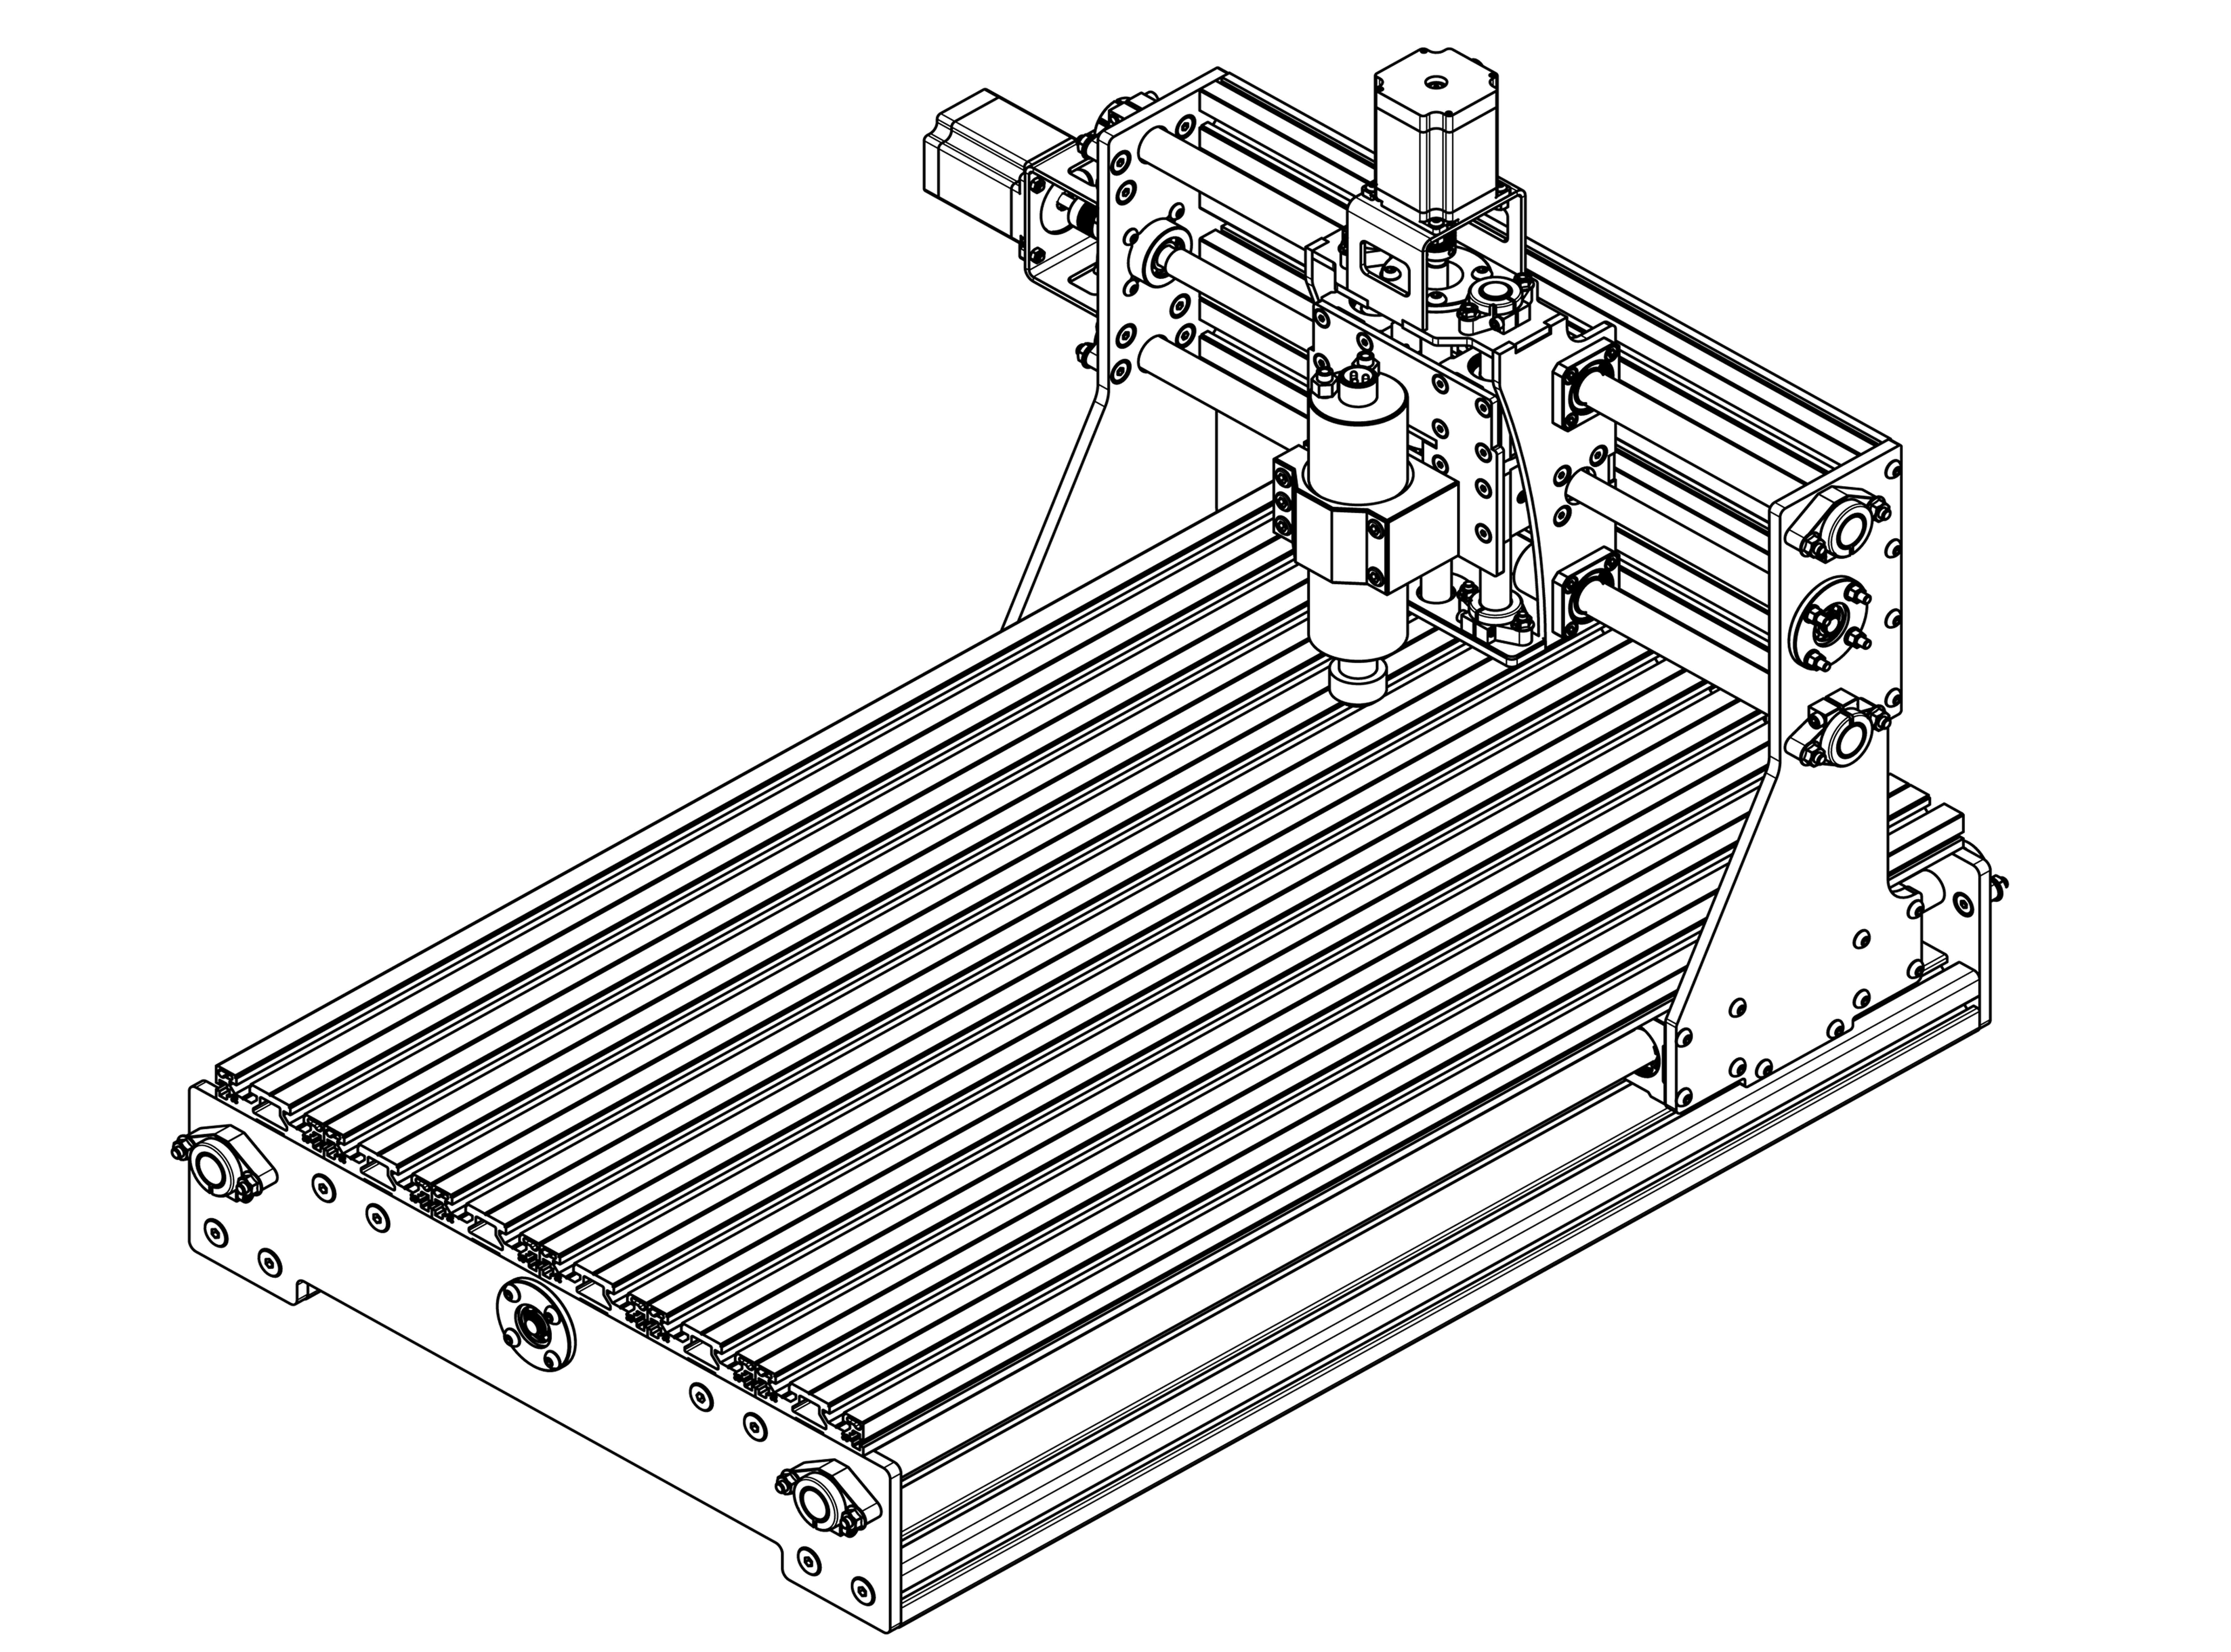 CNC-1.0 000.000 СБ - копия